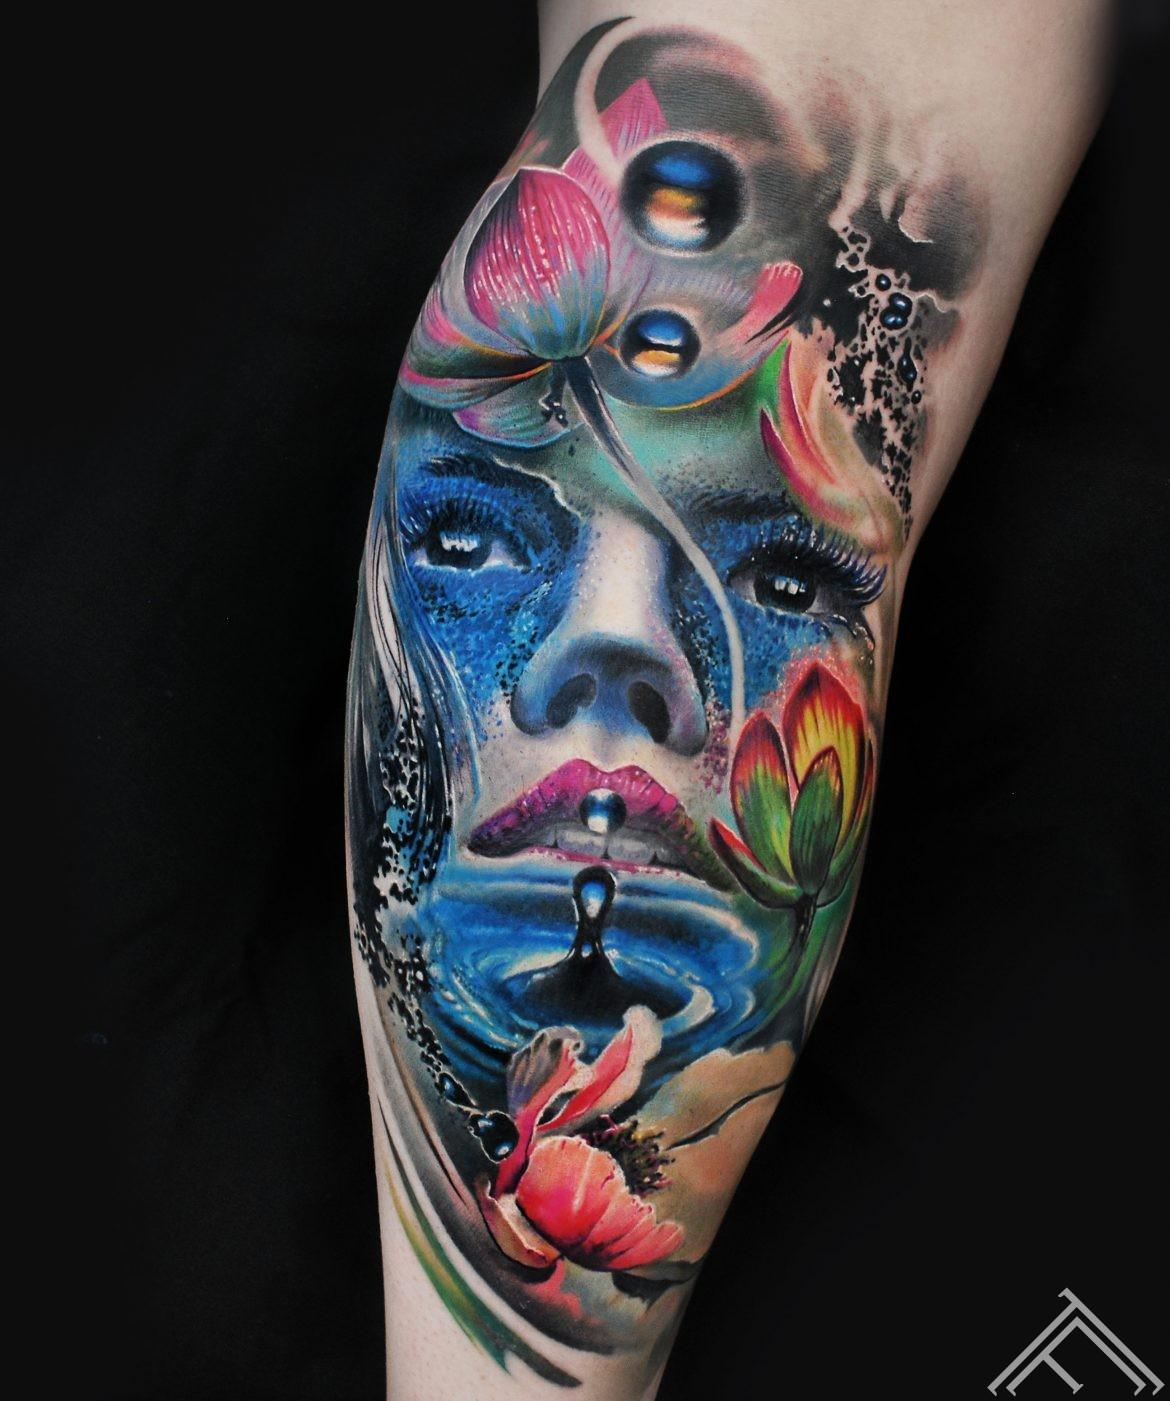 watergirl-waterdrop-lotus-lotos-water-flowers-ziedi-udens-sieviete-tattoo-tetovejums-marispavlo-riga-tattoofrequency